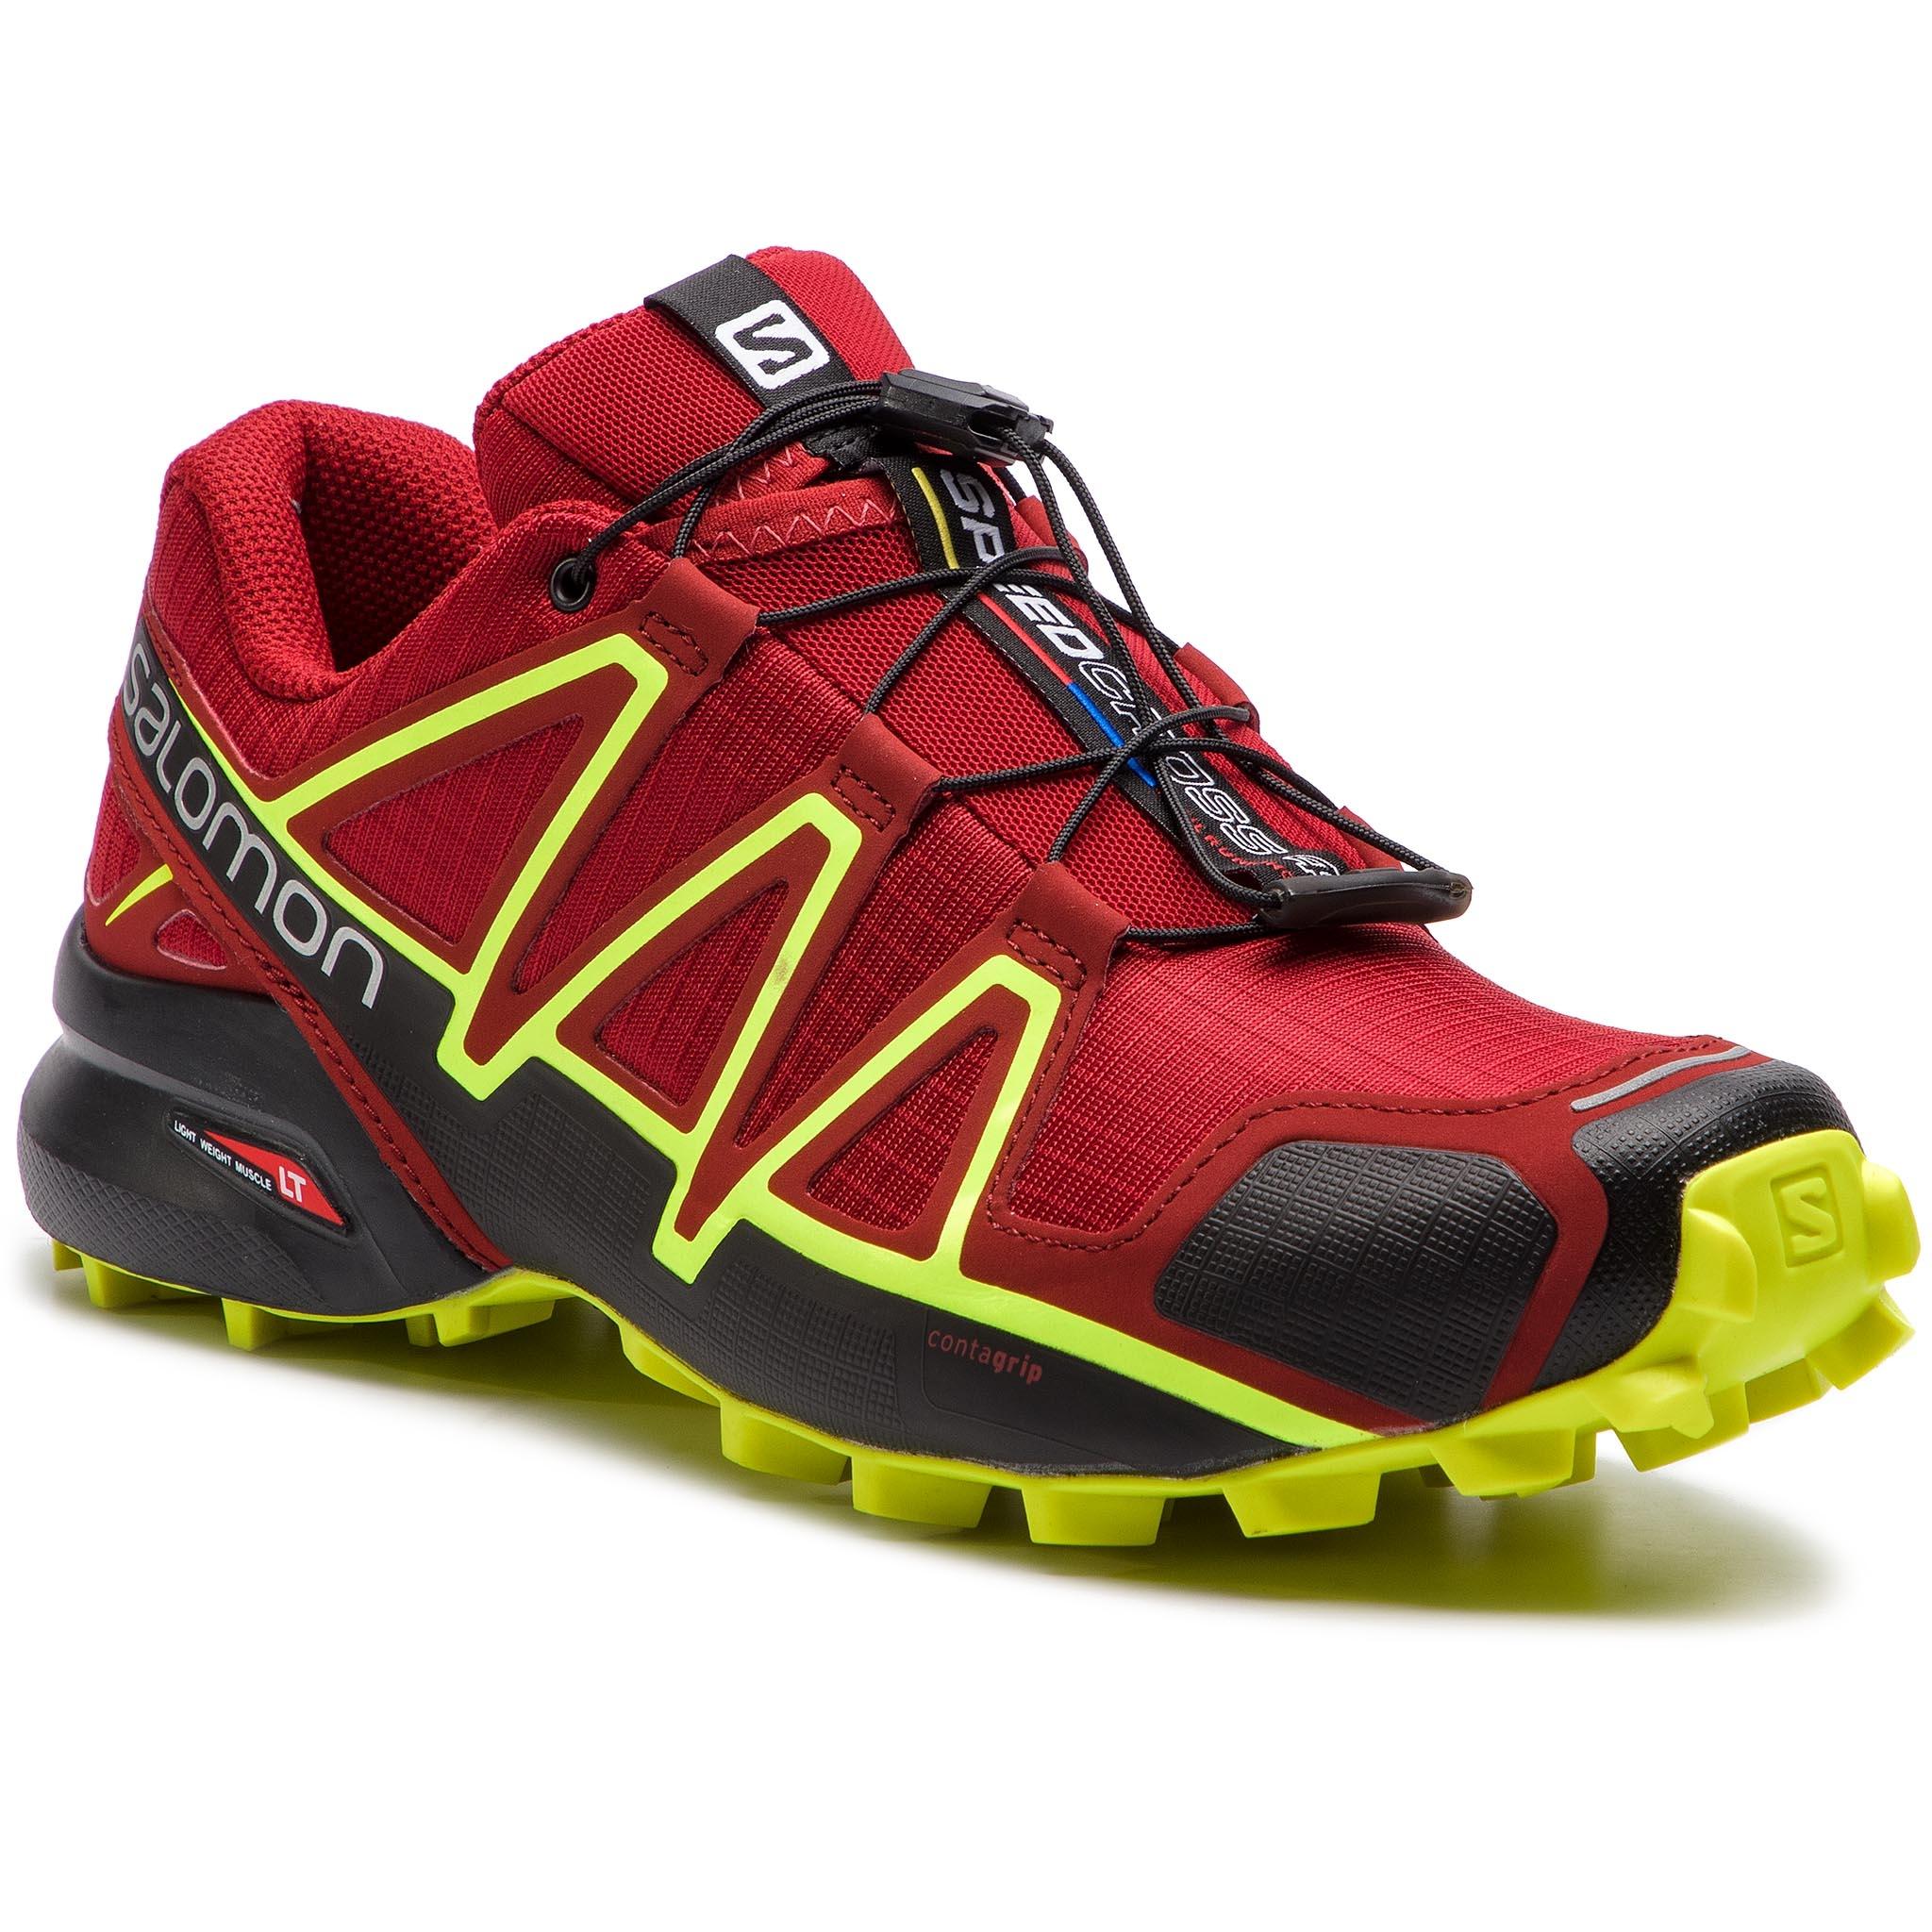 4efccd631ac Shoes SALOMON Speedcross 4 Gtx GORE-TEX 404923 27 G0 Poseidon/Navy  Blazer/Lime Green. €168,00. €118,00 · Shoes SALOMON